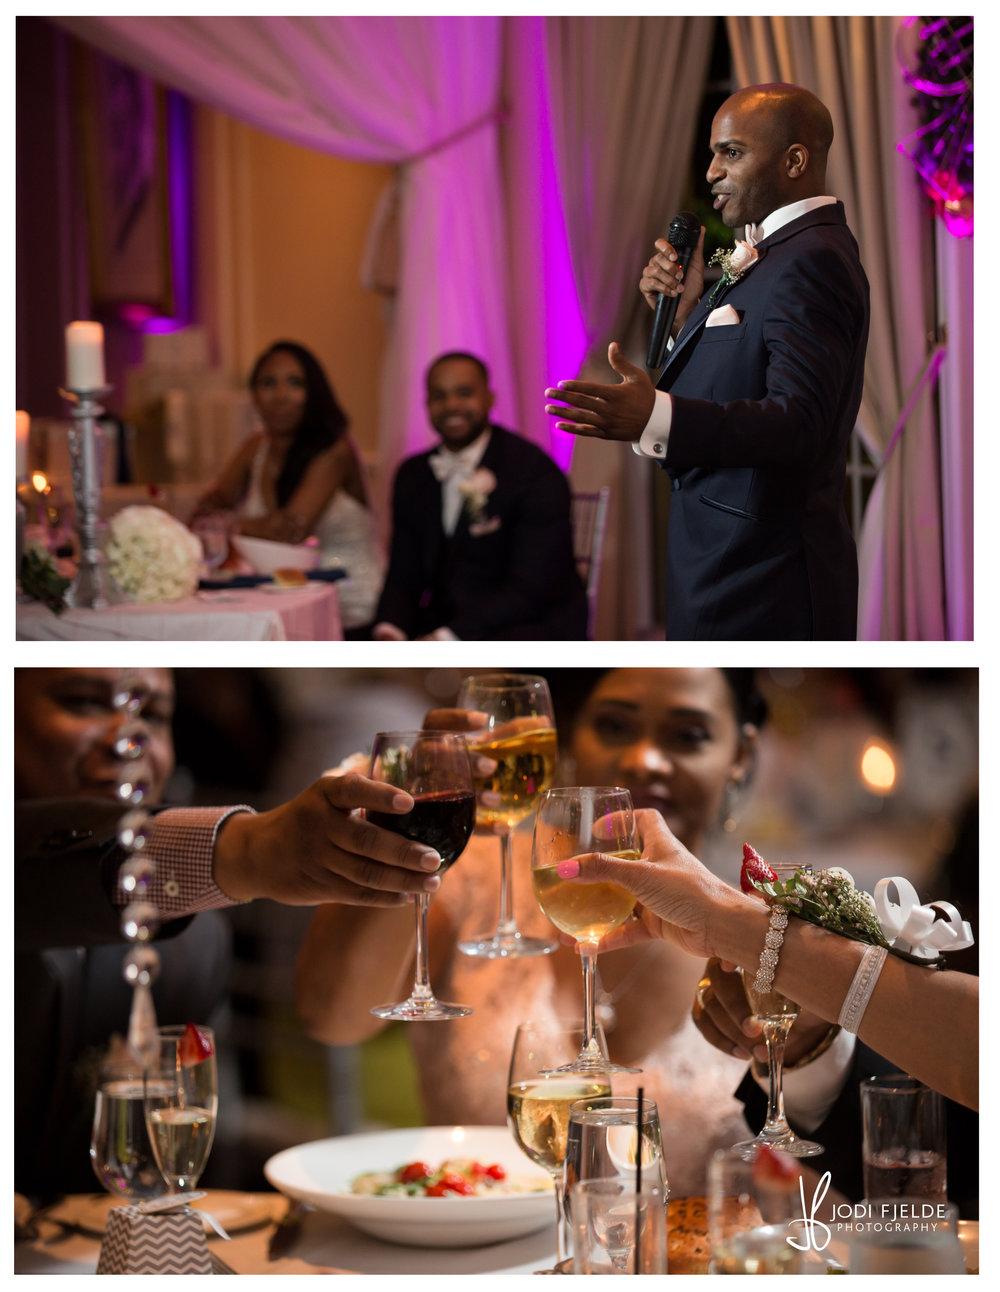 Benvenuto_wedding_Boynton_Beach_Jodi_Fjelde_Photography_Nikki_Otis_married_29.jpg